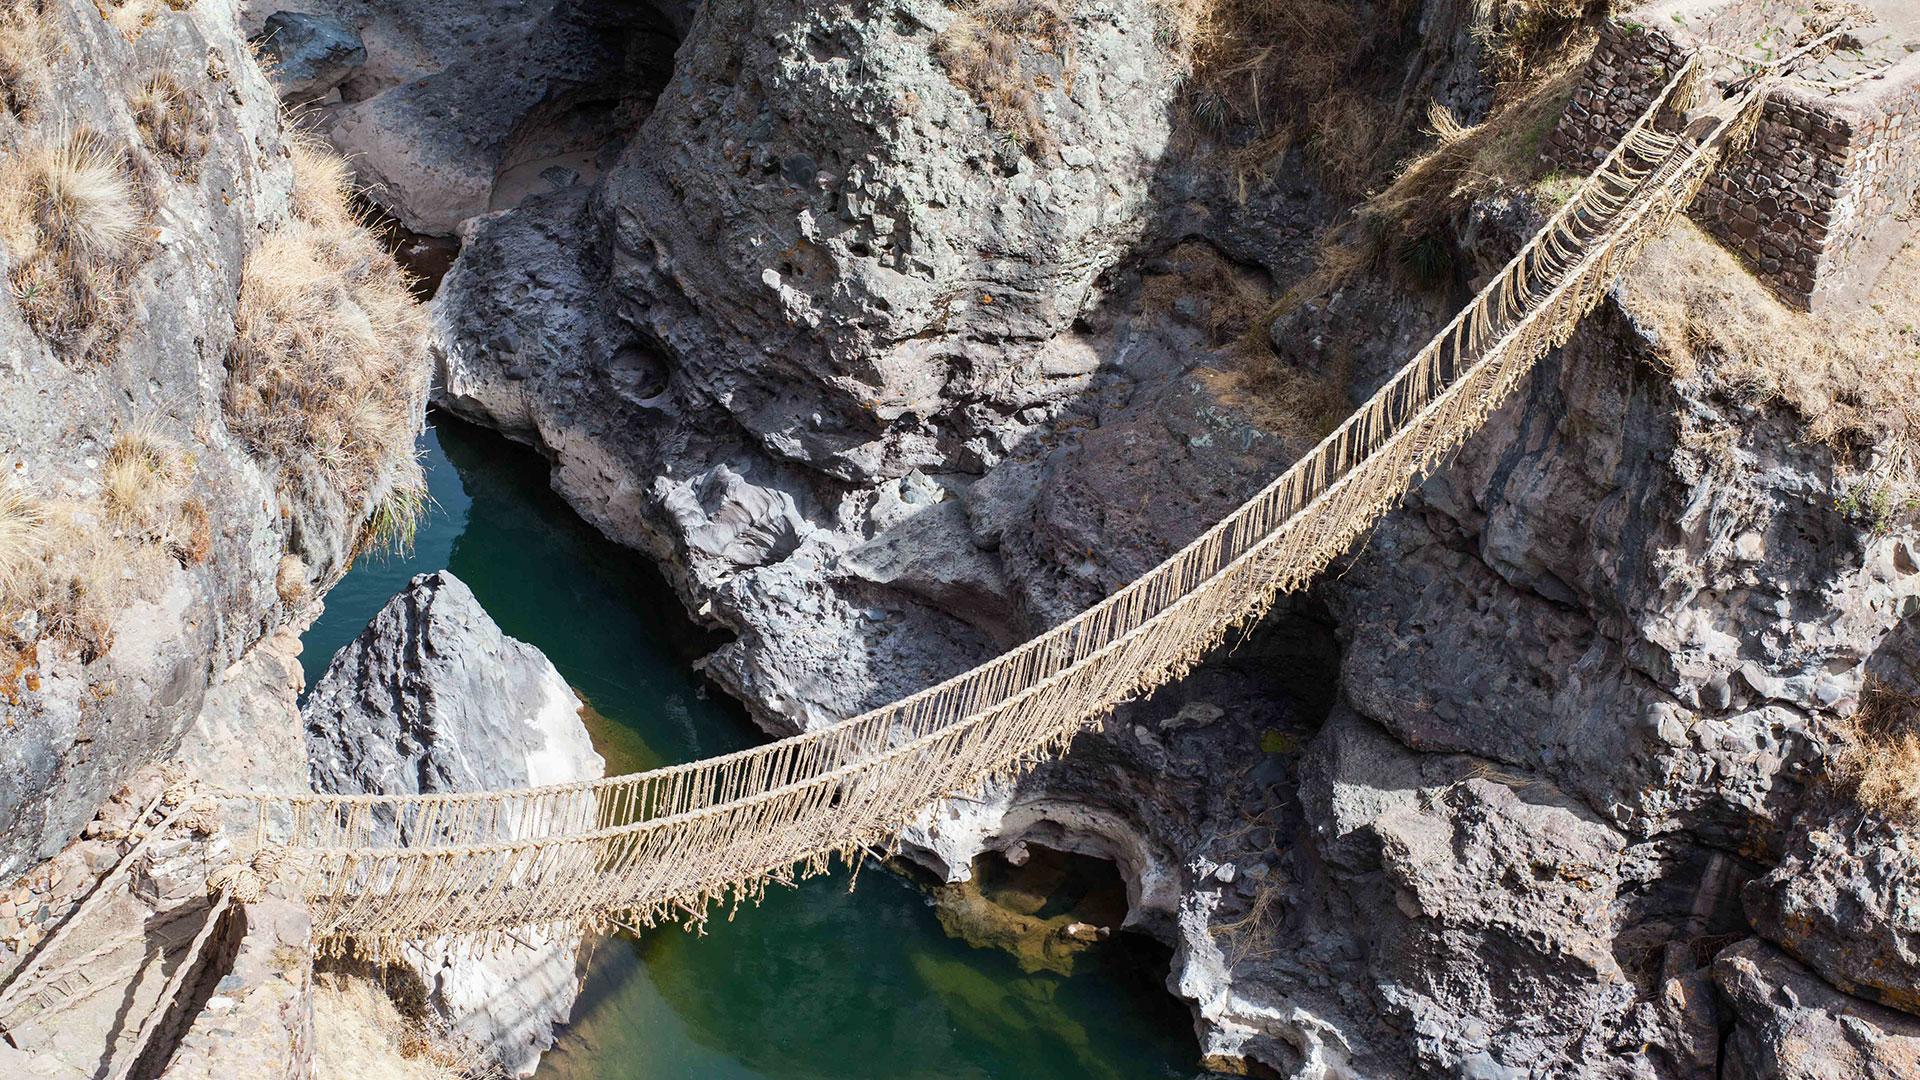 An overhead view of the Q'eswachaka Bridge in Peru.